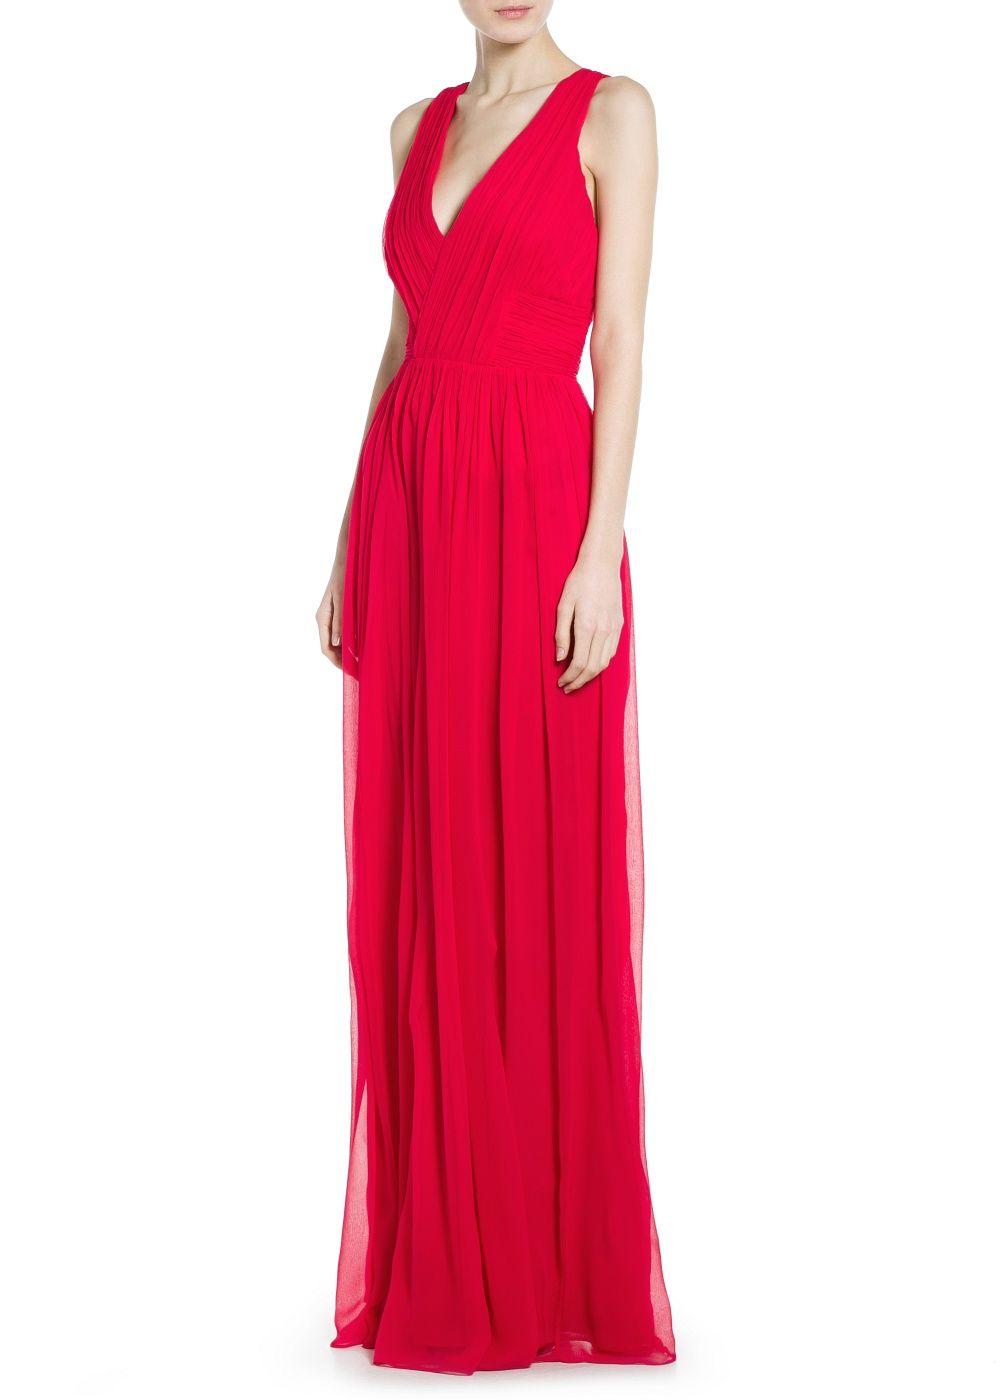 1fd66f25afc91 Robe longue soie - Femme